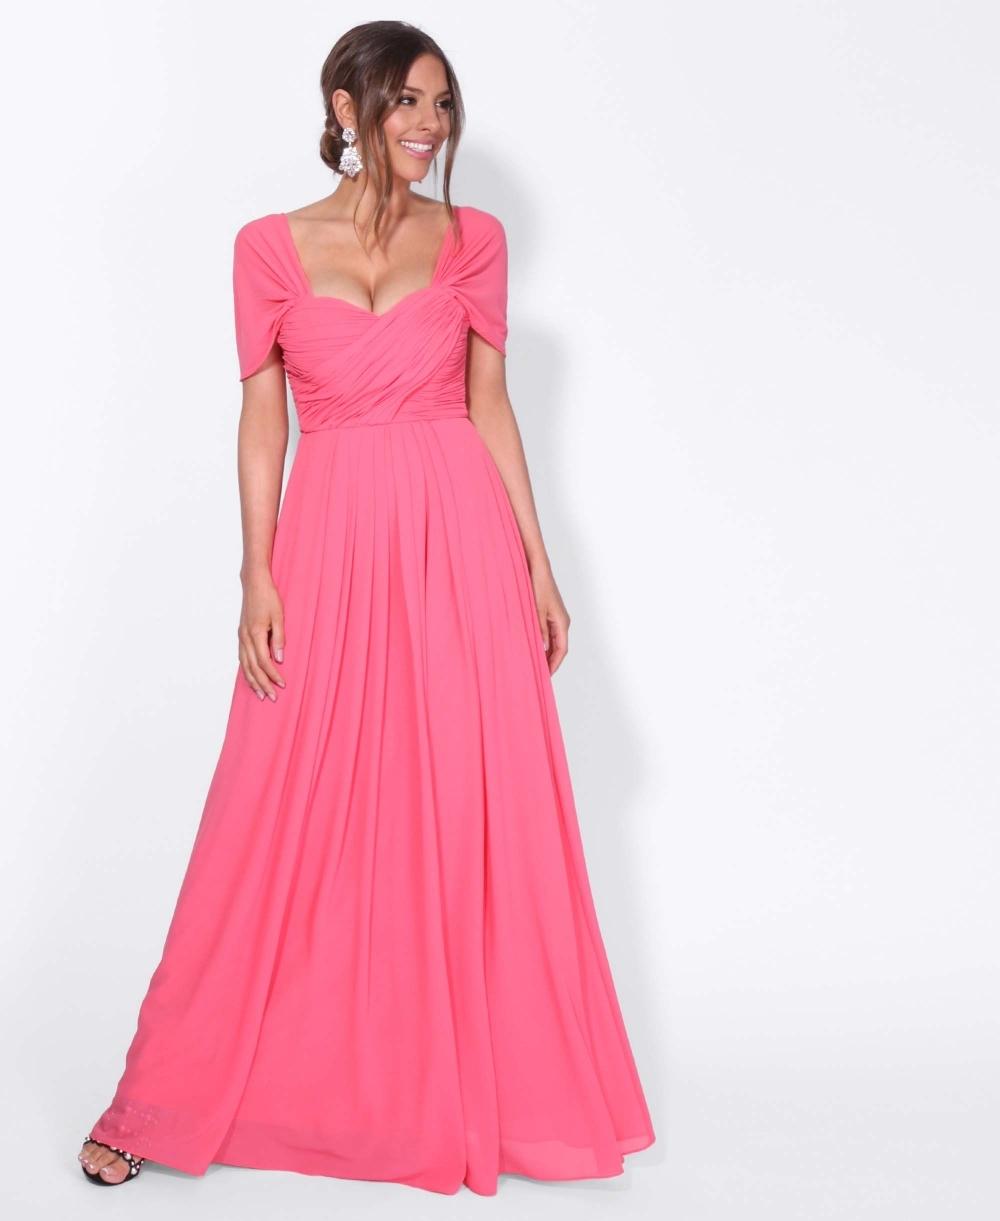 712238e1 Prom Dresses | Cross Pleats Maxi Prom Dress | KRISP